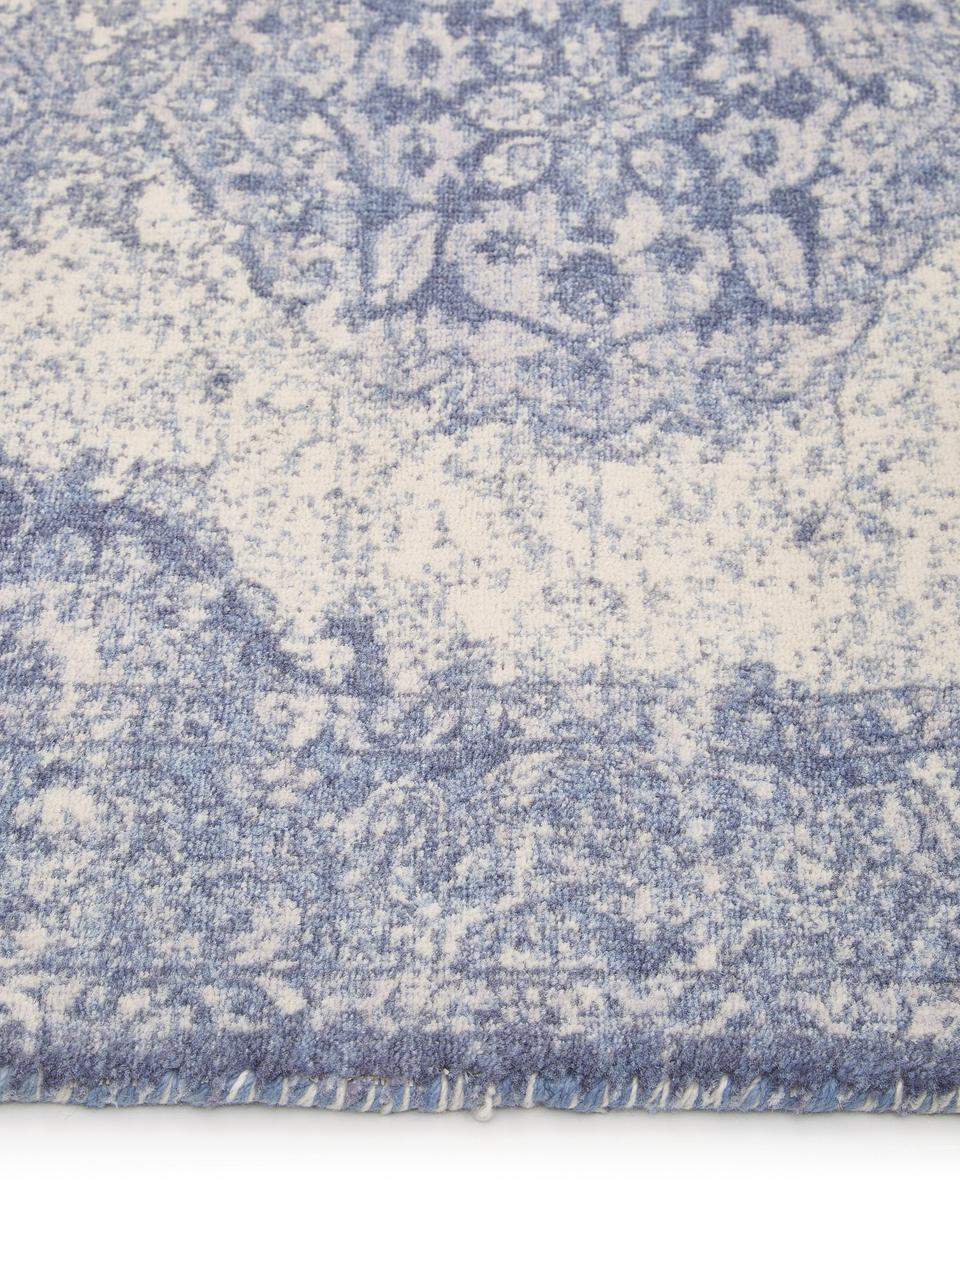 Teppich Elegant im Vintage Style, Flor: 100% Nylon, Blau, B 80 x L 150 cm (Größe XS)